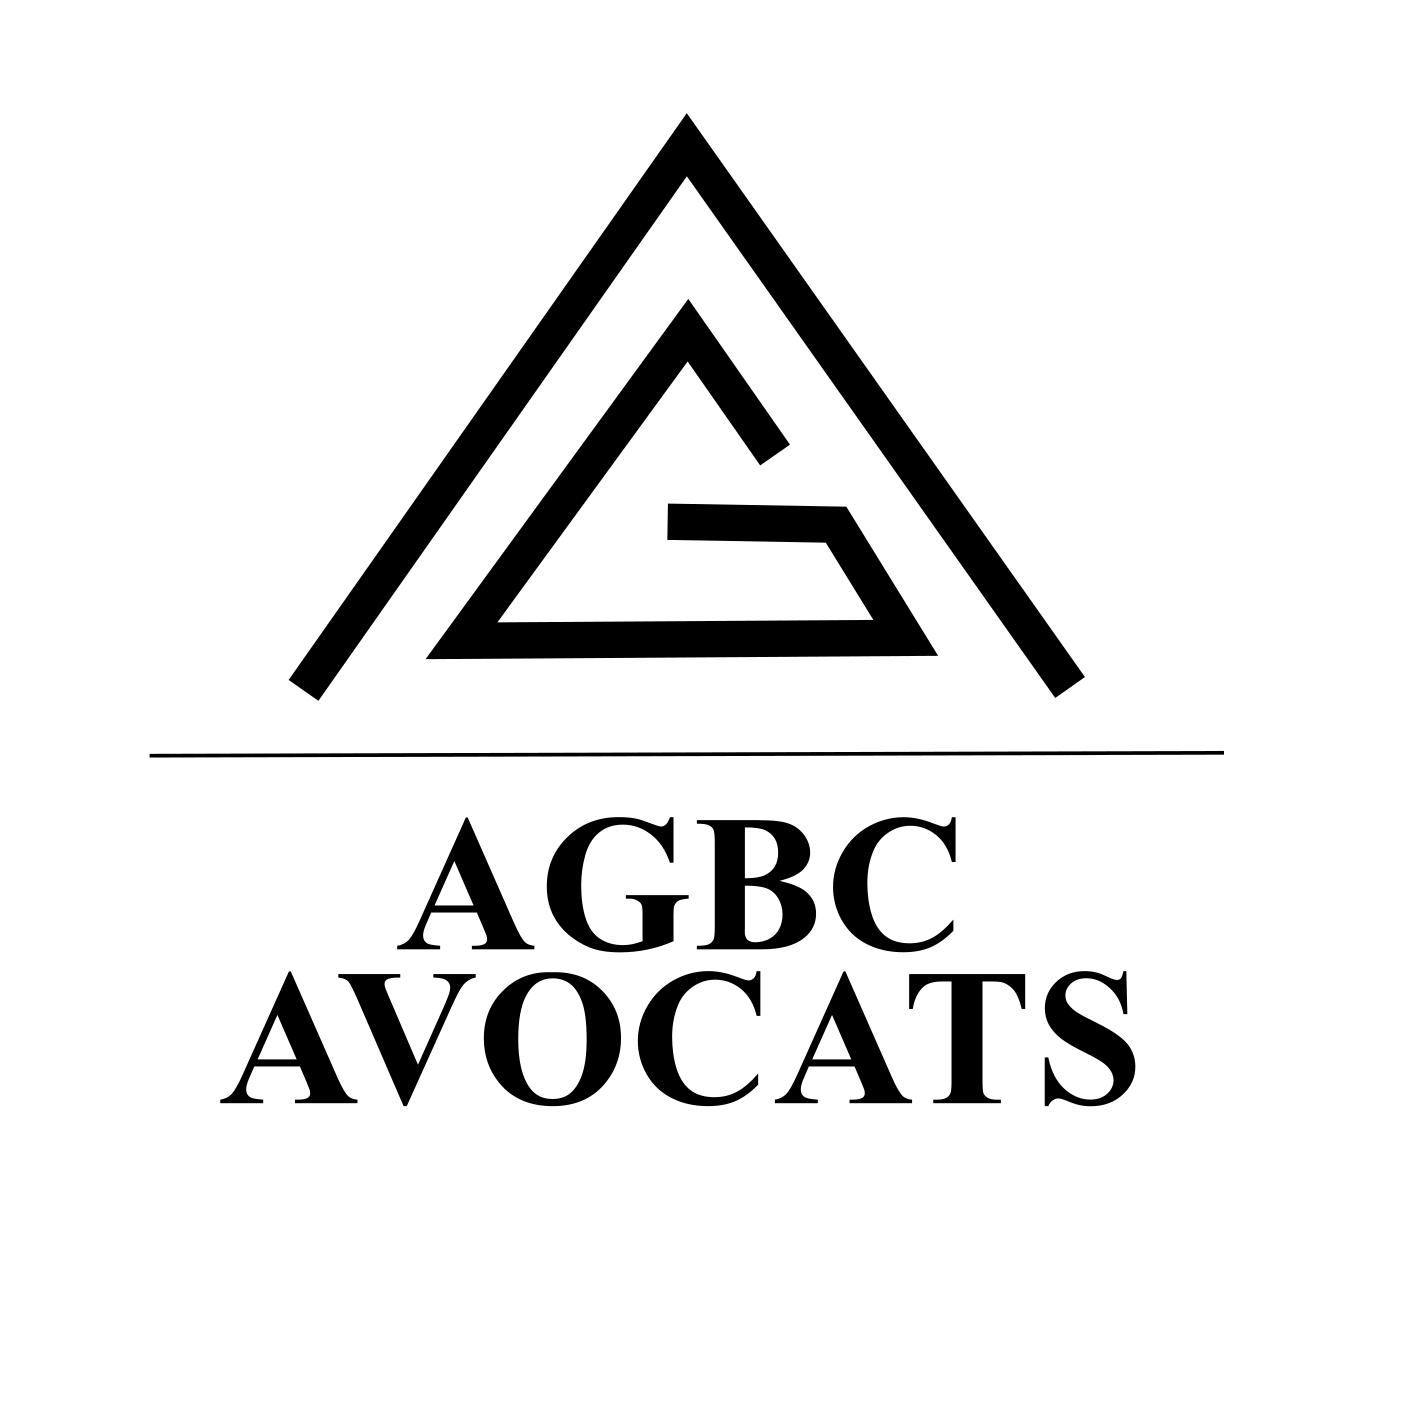 AGBC-avocats